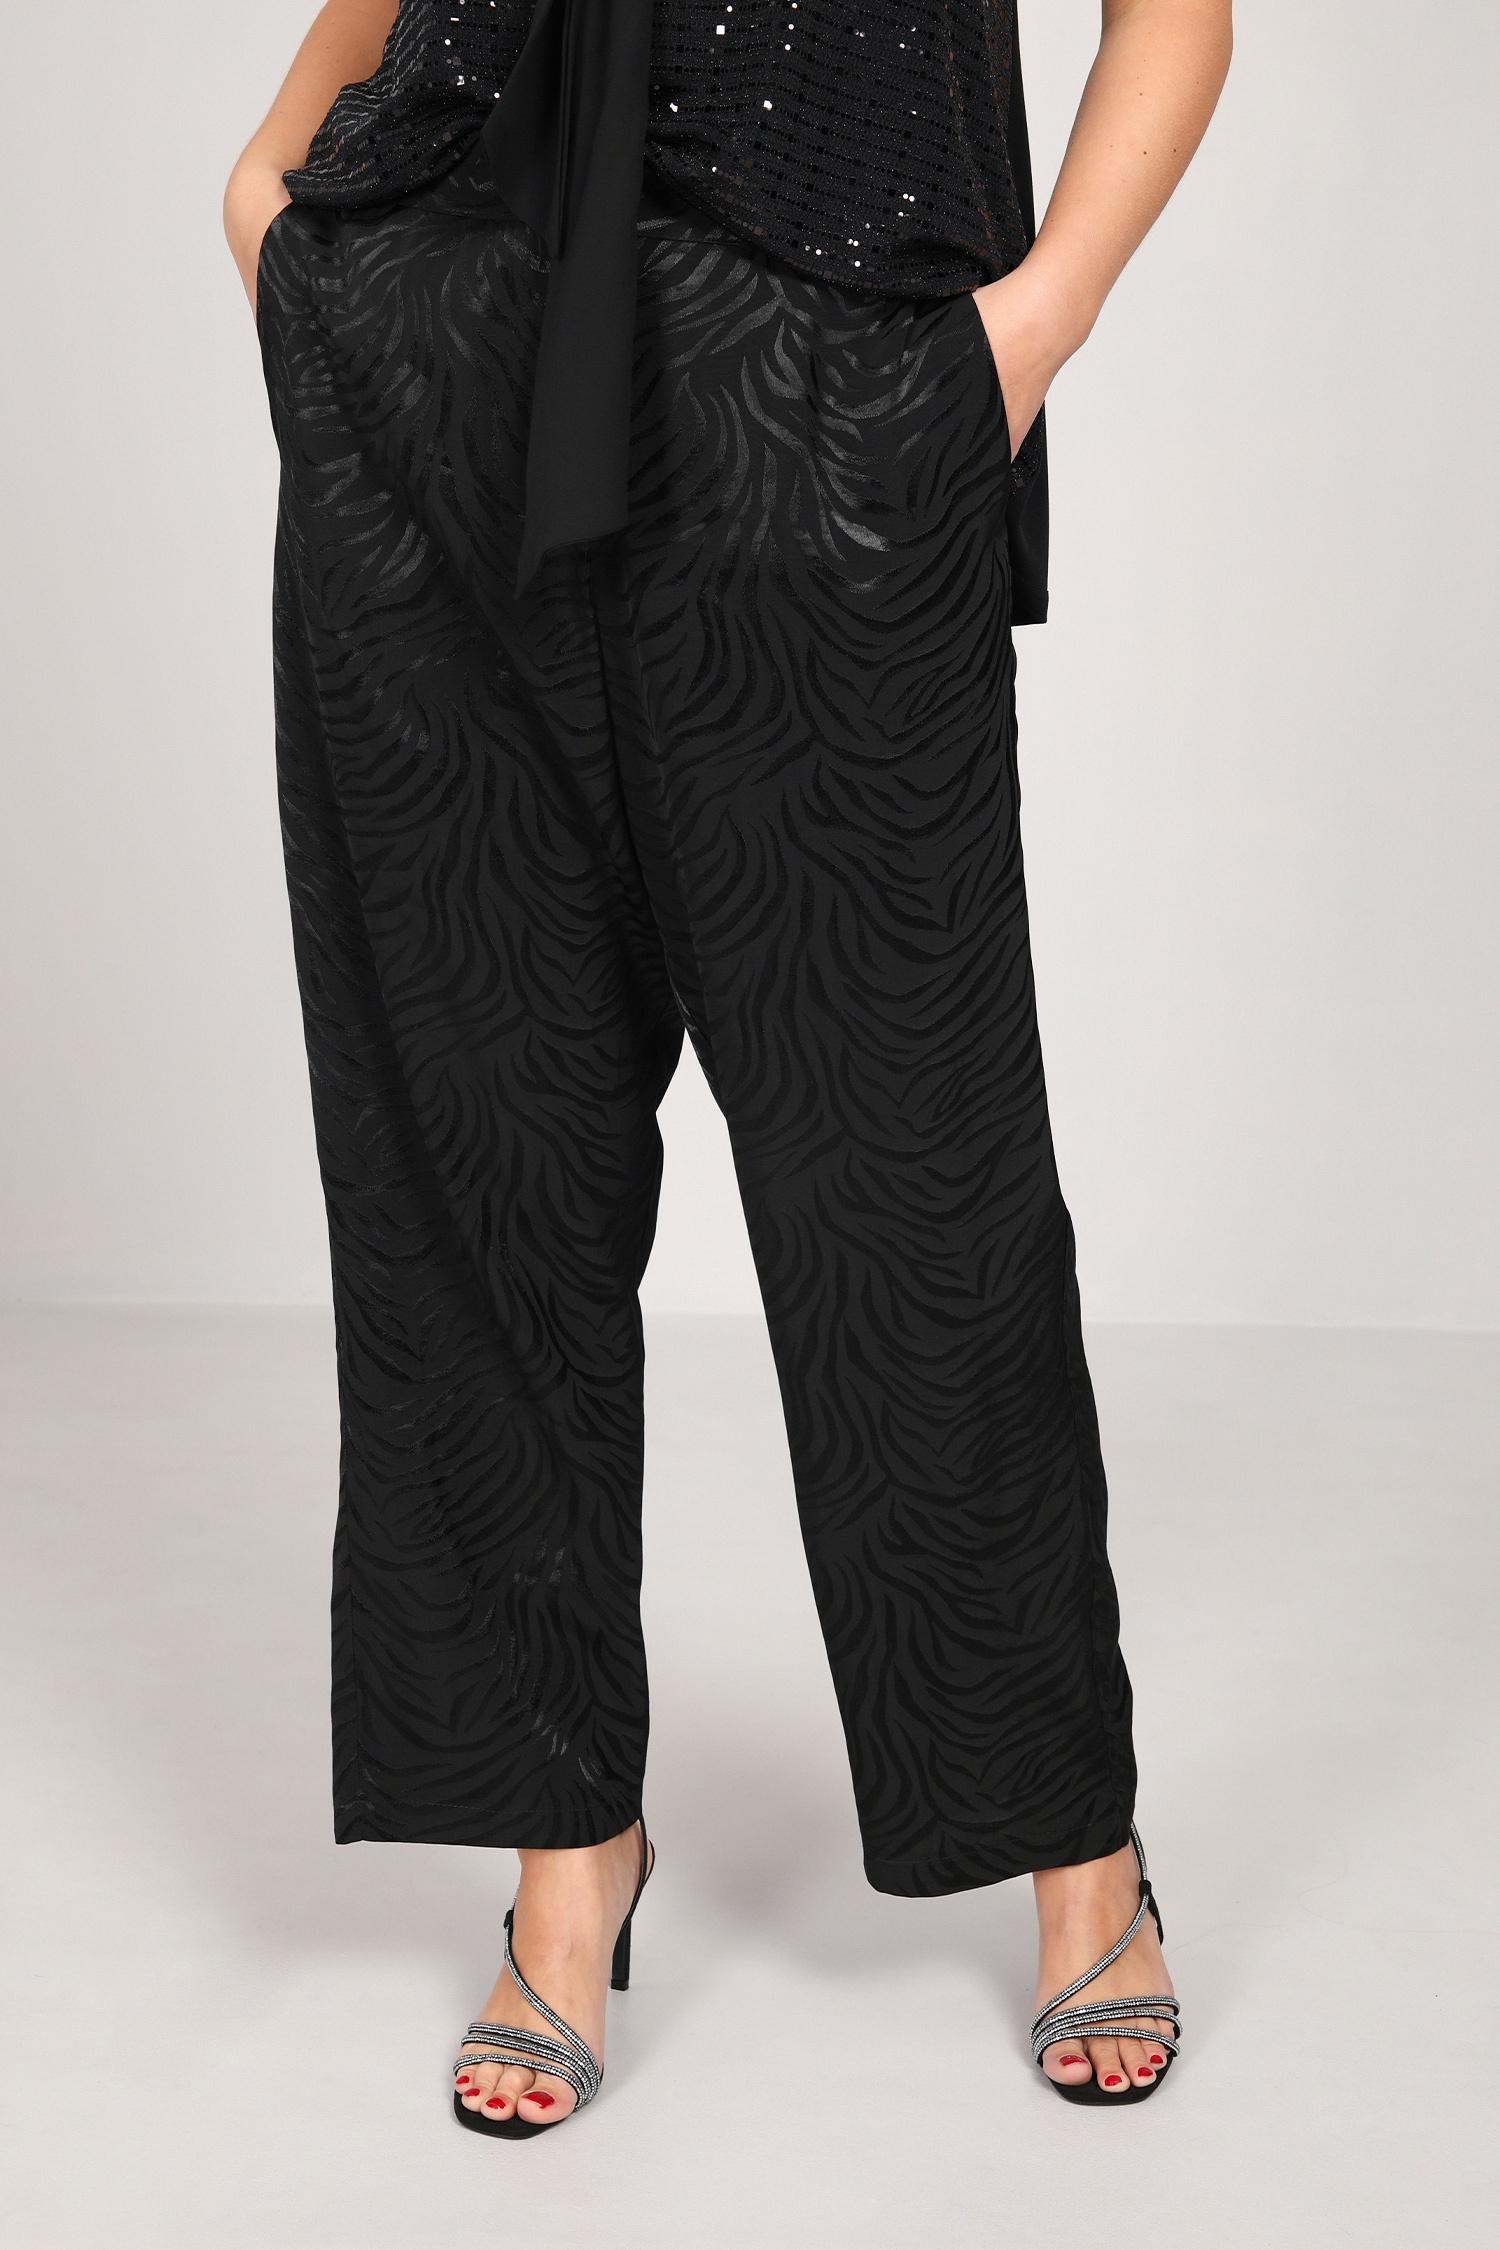 Zebra Print Crepe Pants